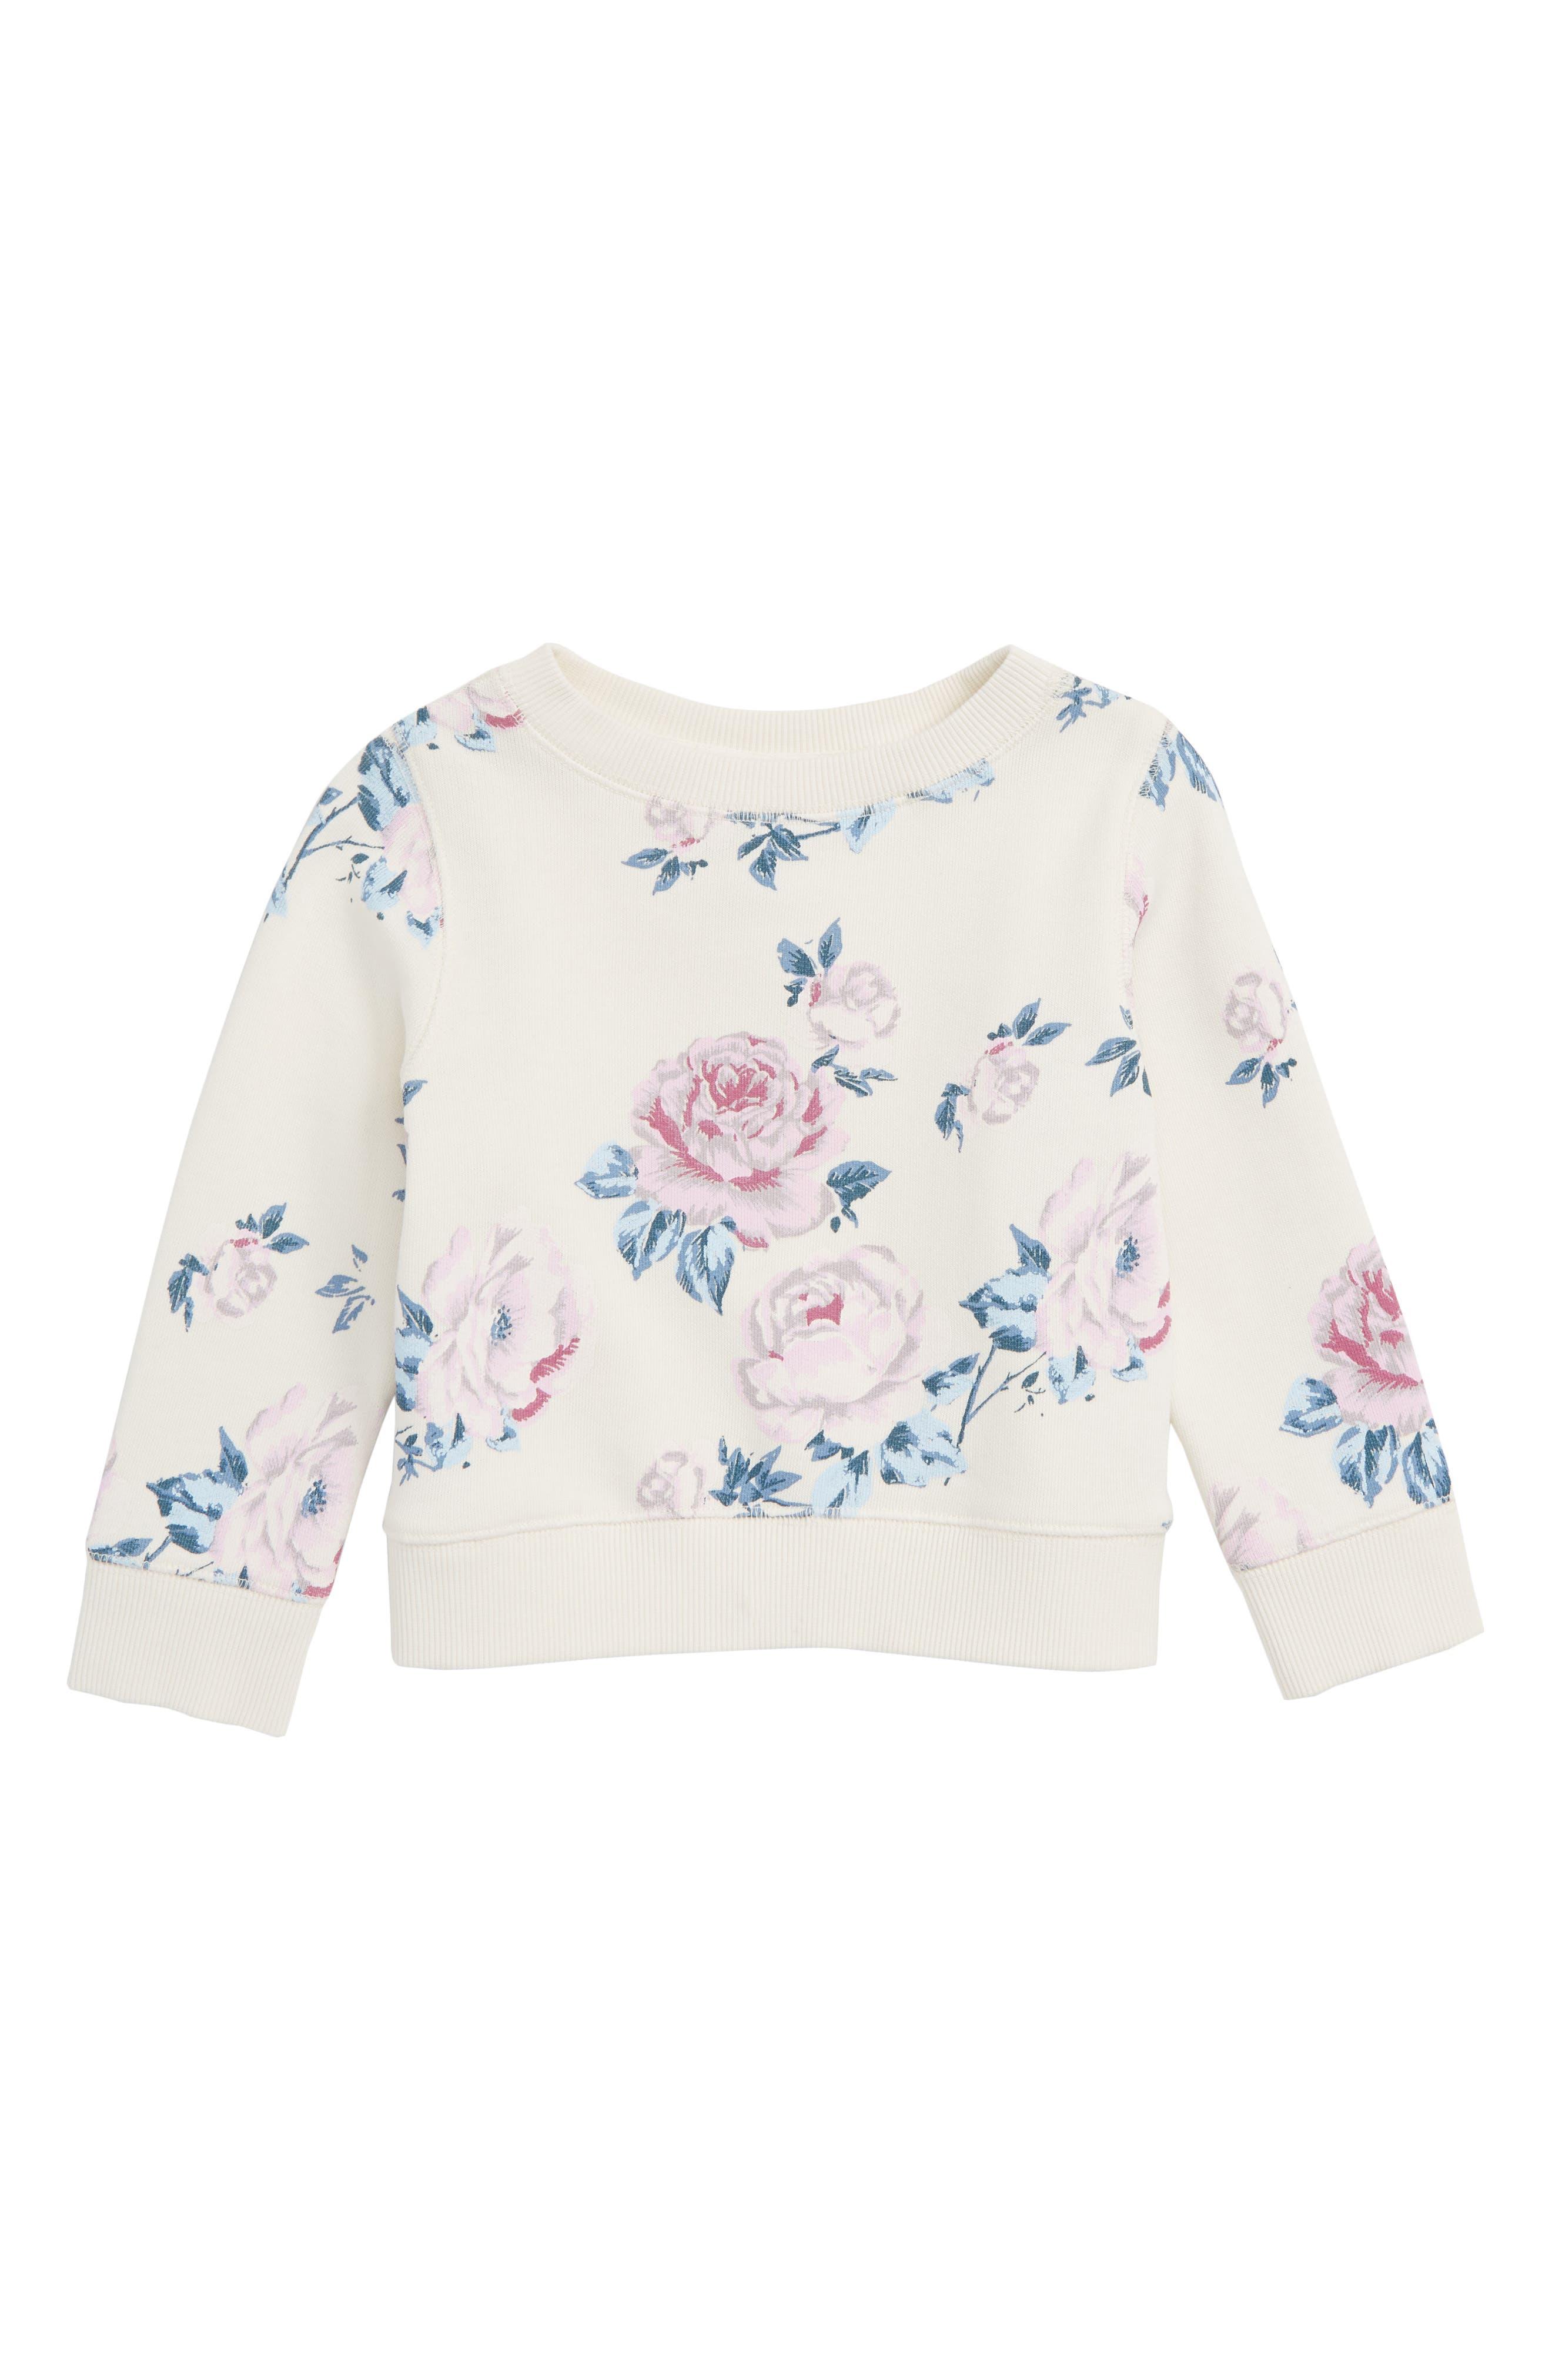 Mara Sweatshirt,                         Main,                         color, 100